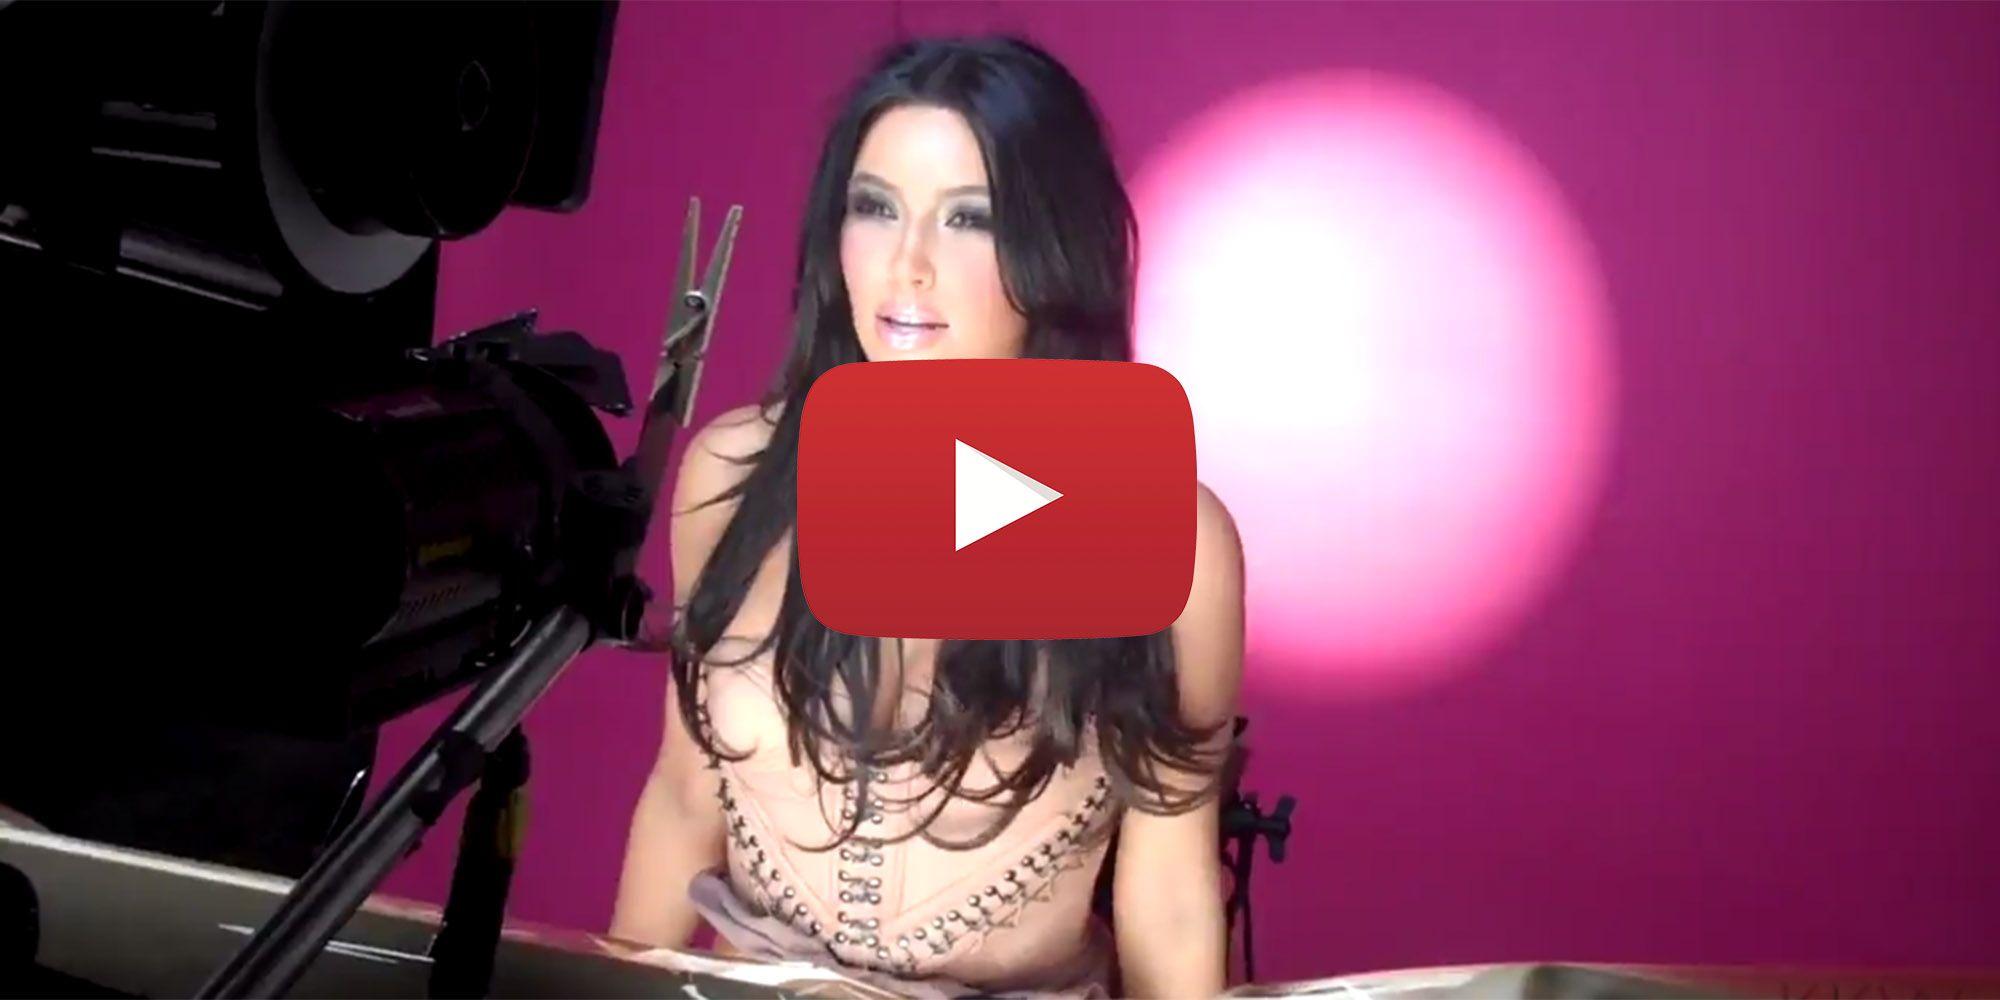 Kim Kardashian Music Video Flashback - Kanye Visits Kim on the Set ...